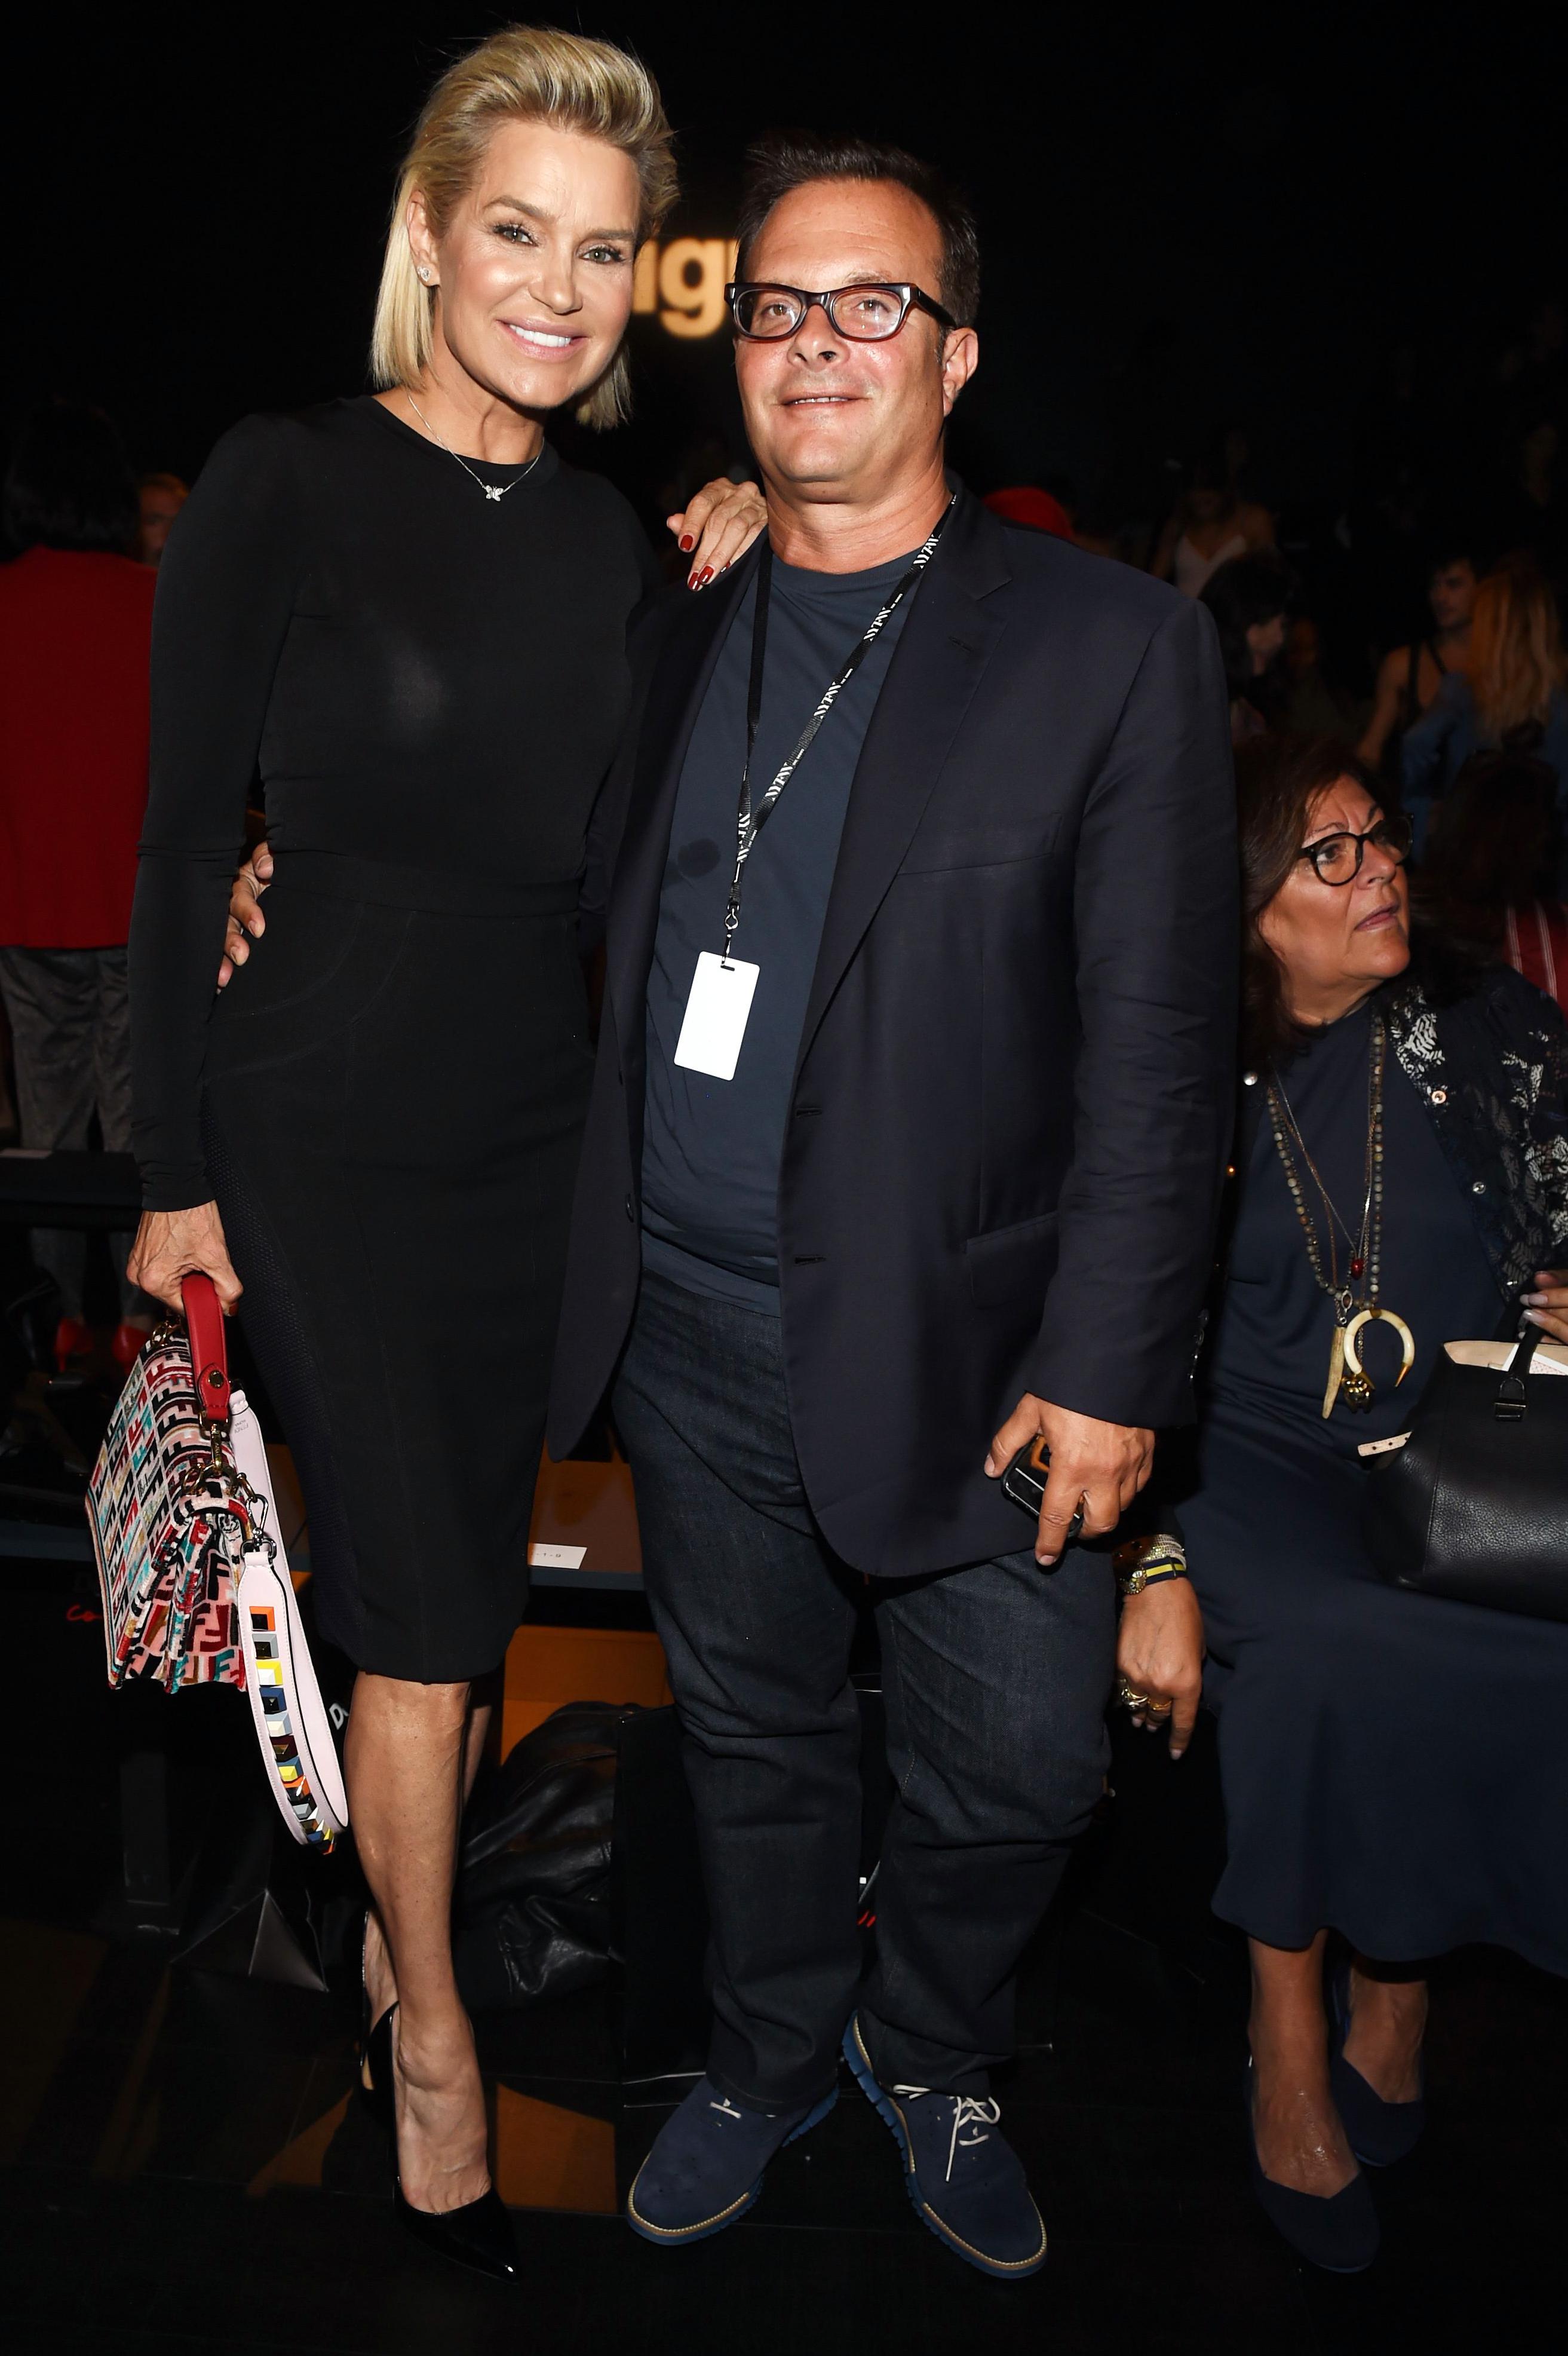 Yolanda Hadid and Ivan Bart in the front rowDesigual show, Front Row, Spring Summer 2018, New York Fashion Week, USA - 07 Sep 2017